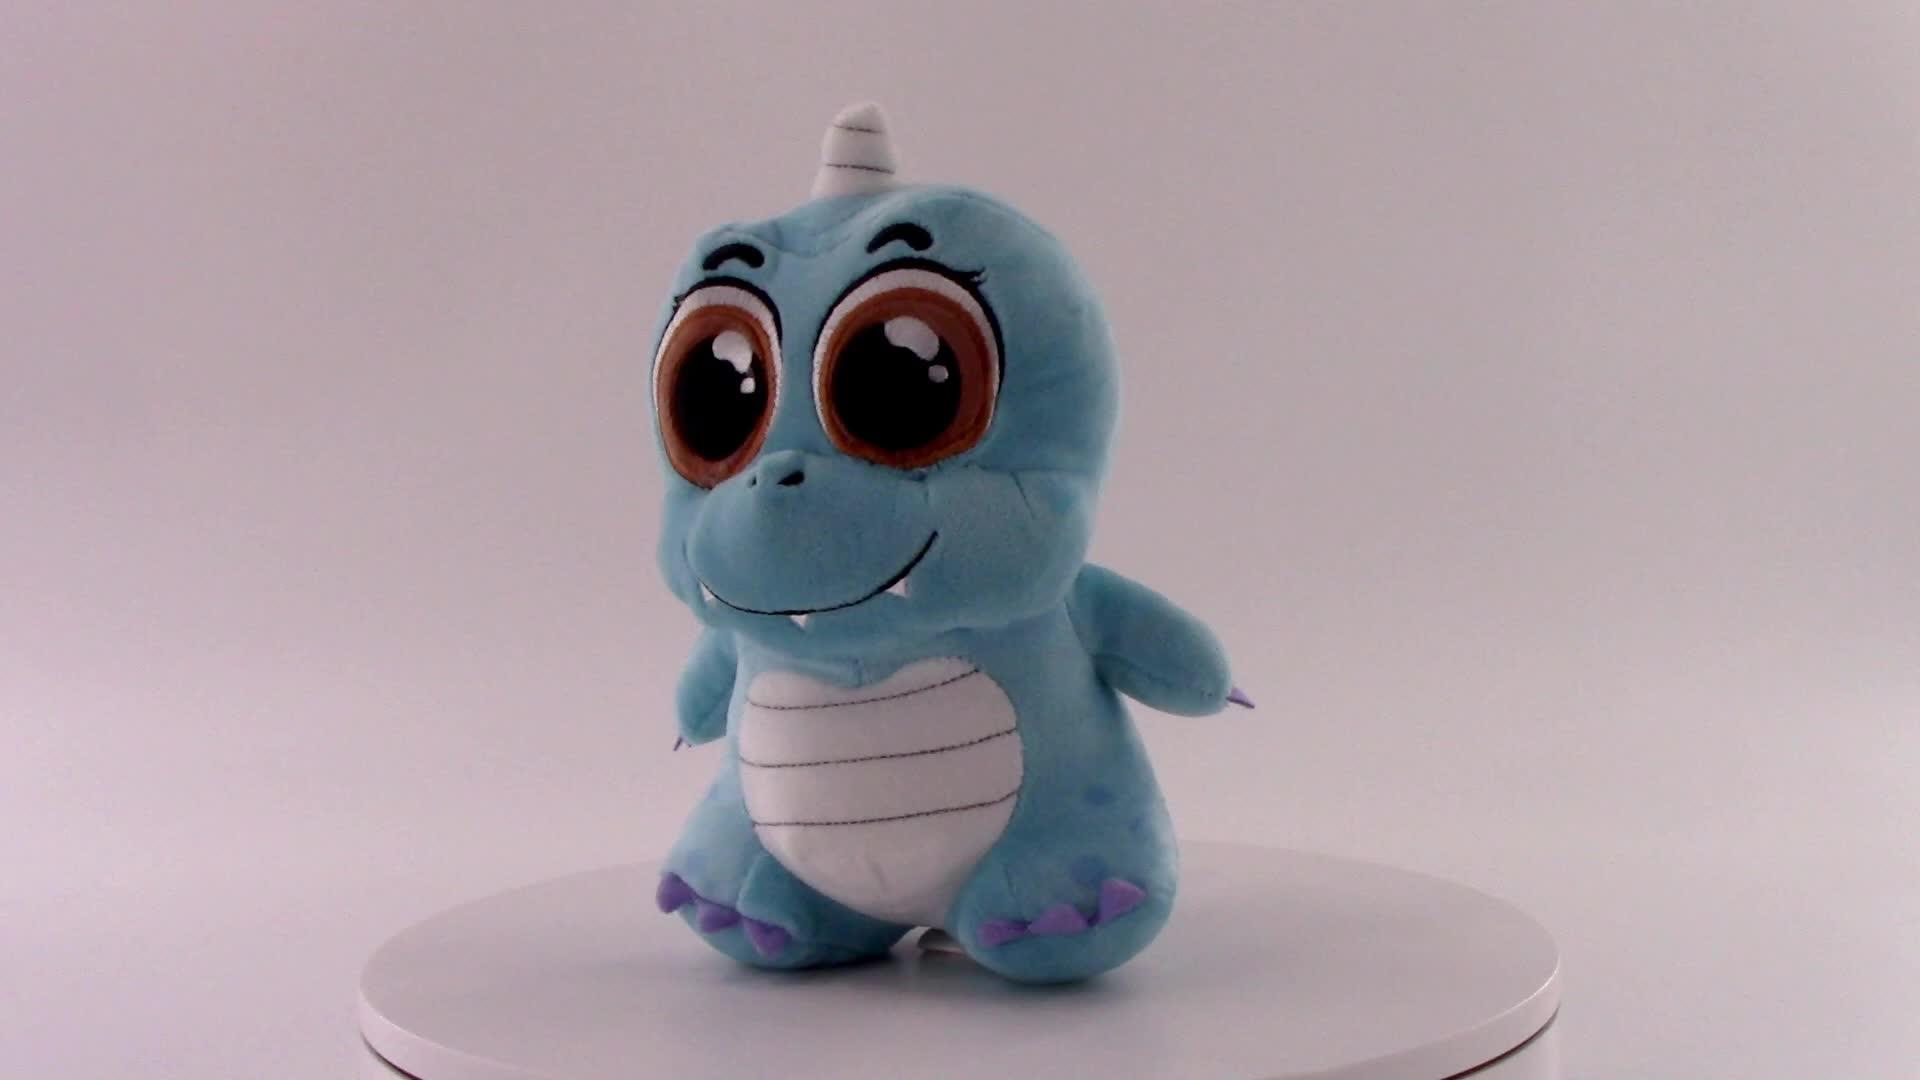 Custom blue baby stuffed animal plush dinosaur toy